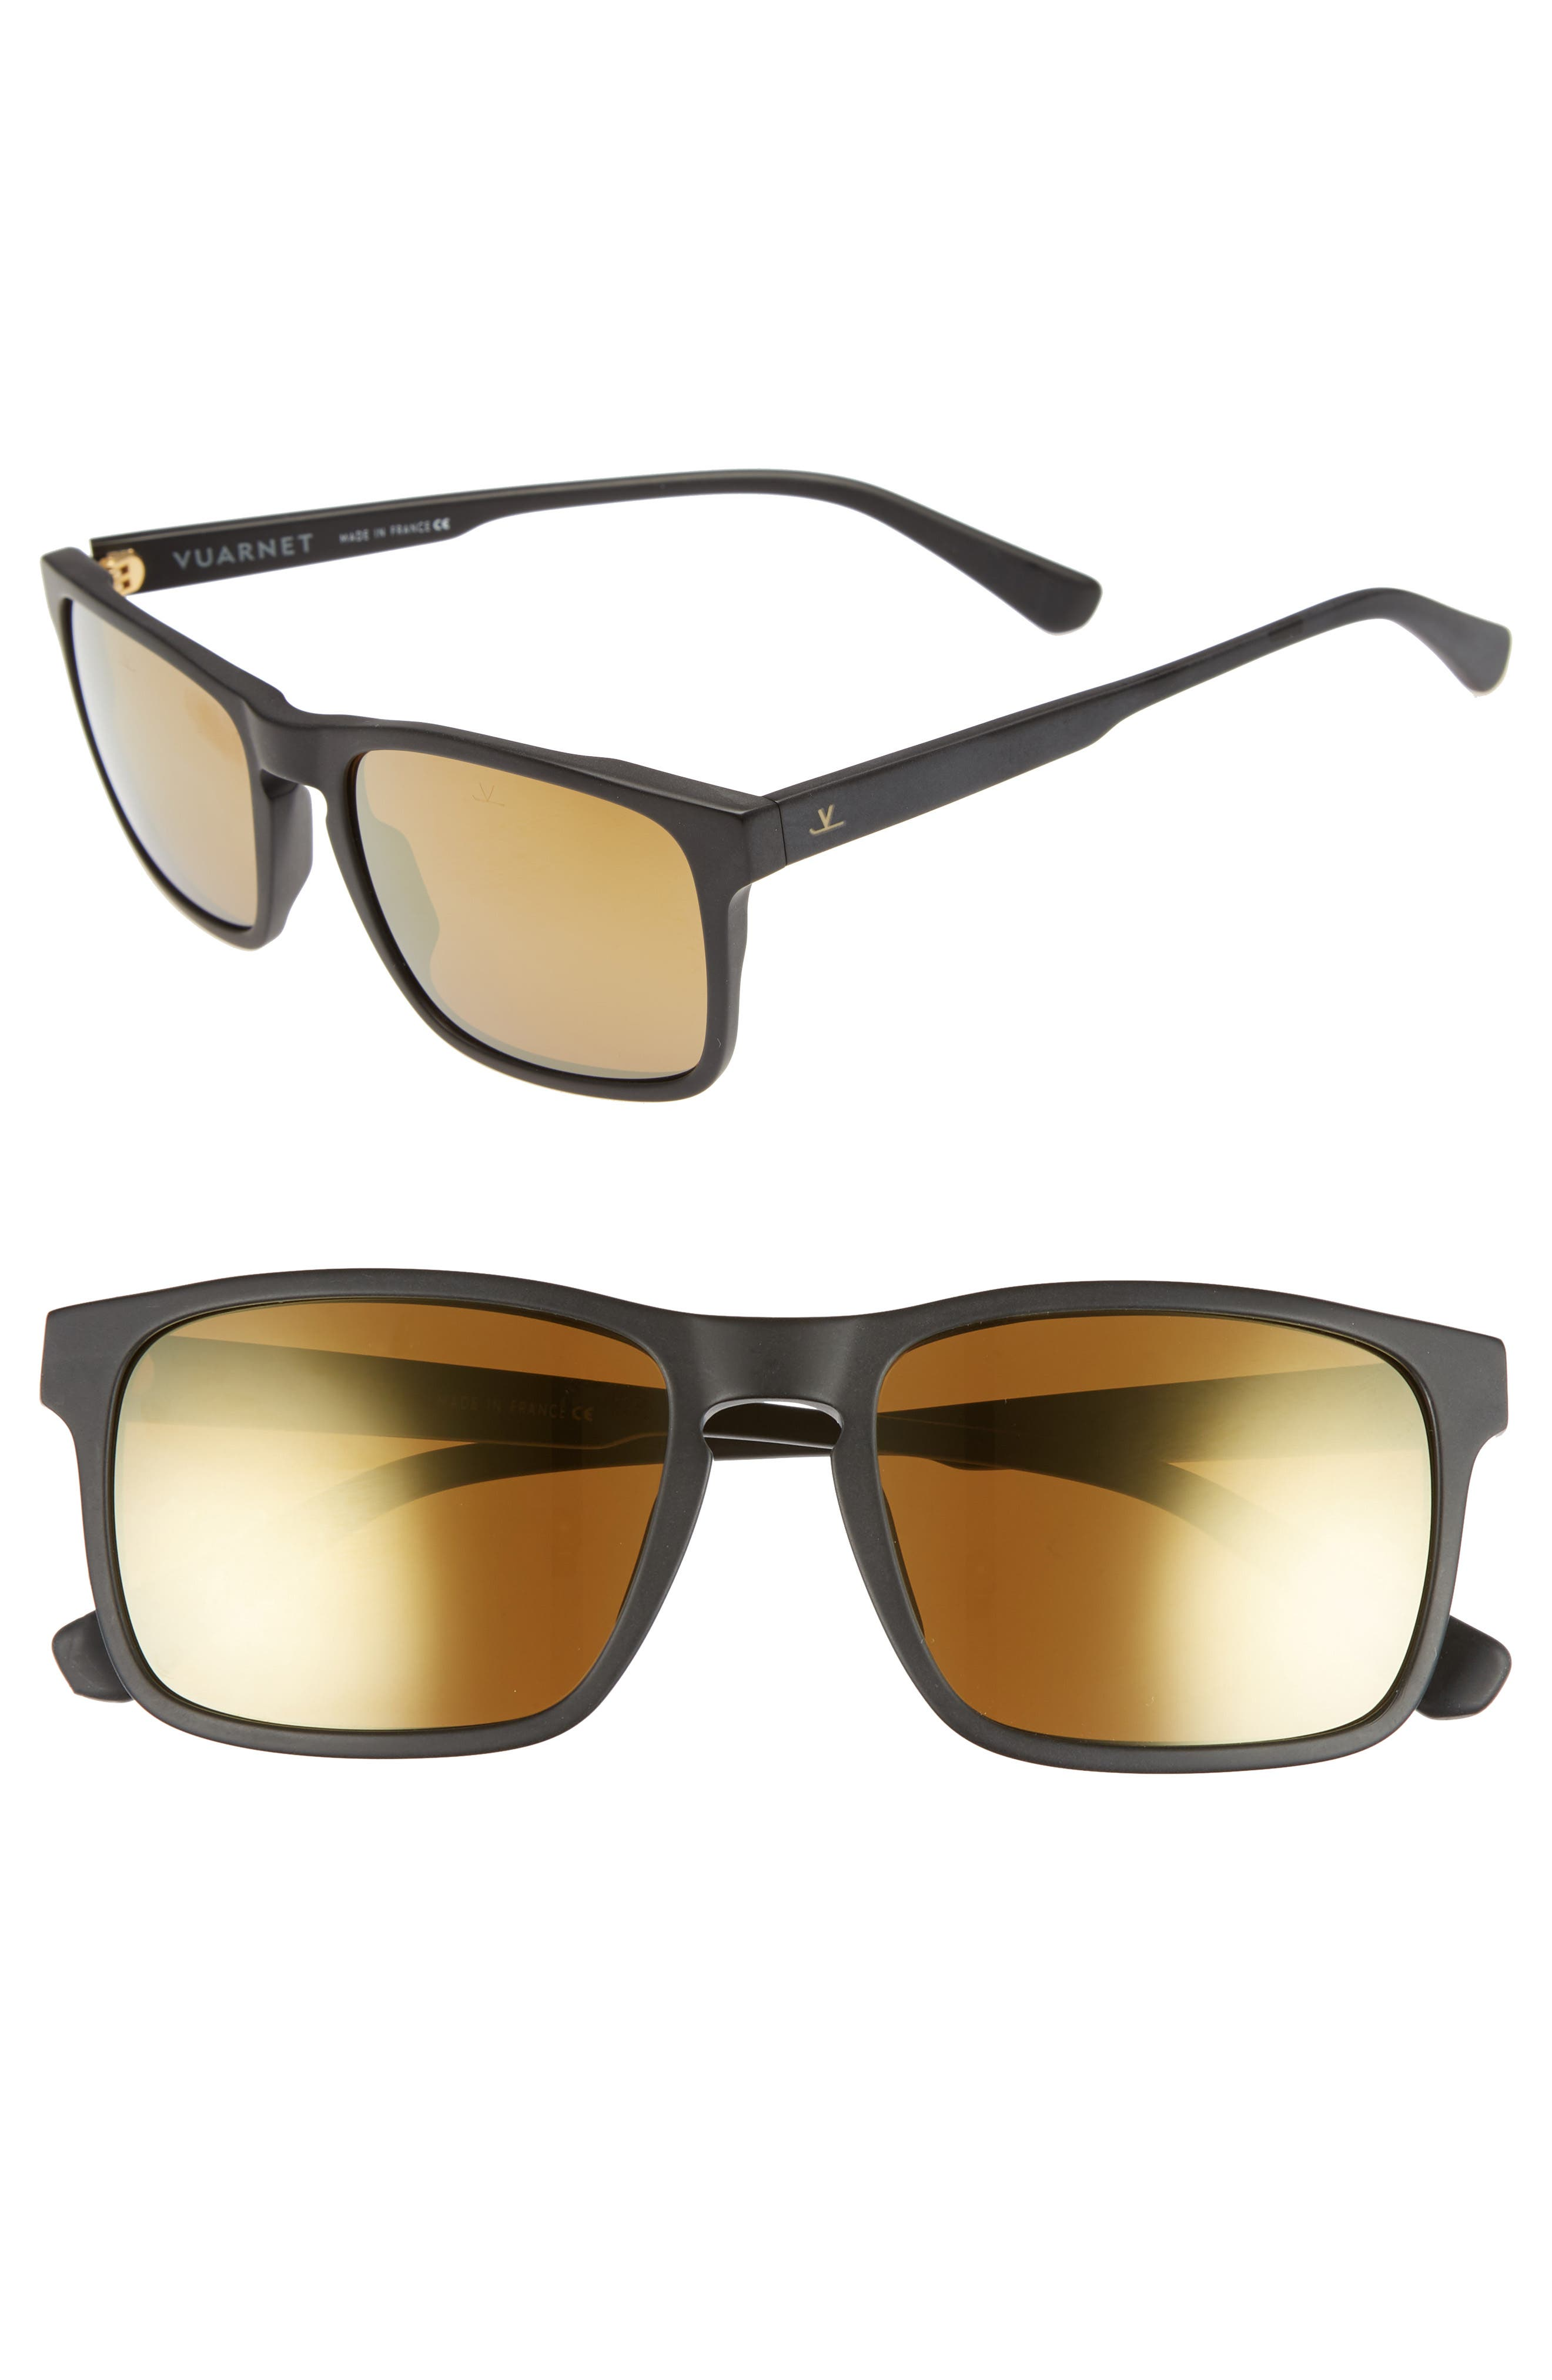 VUARNET Men'S District Large Rectangular Acetate Sunglasses in Black